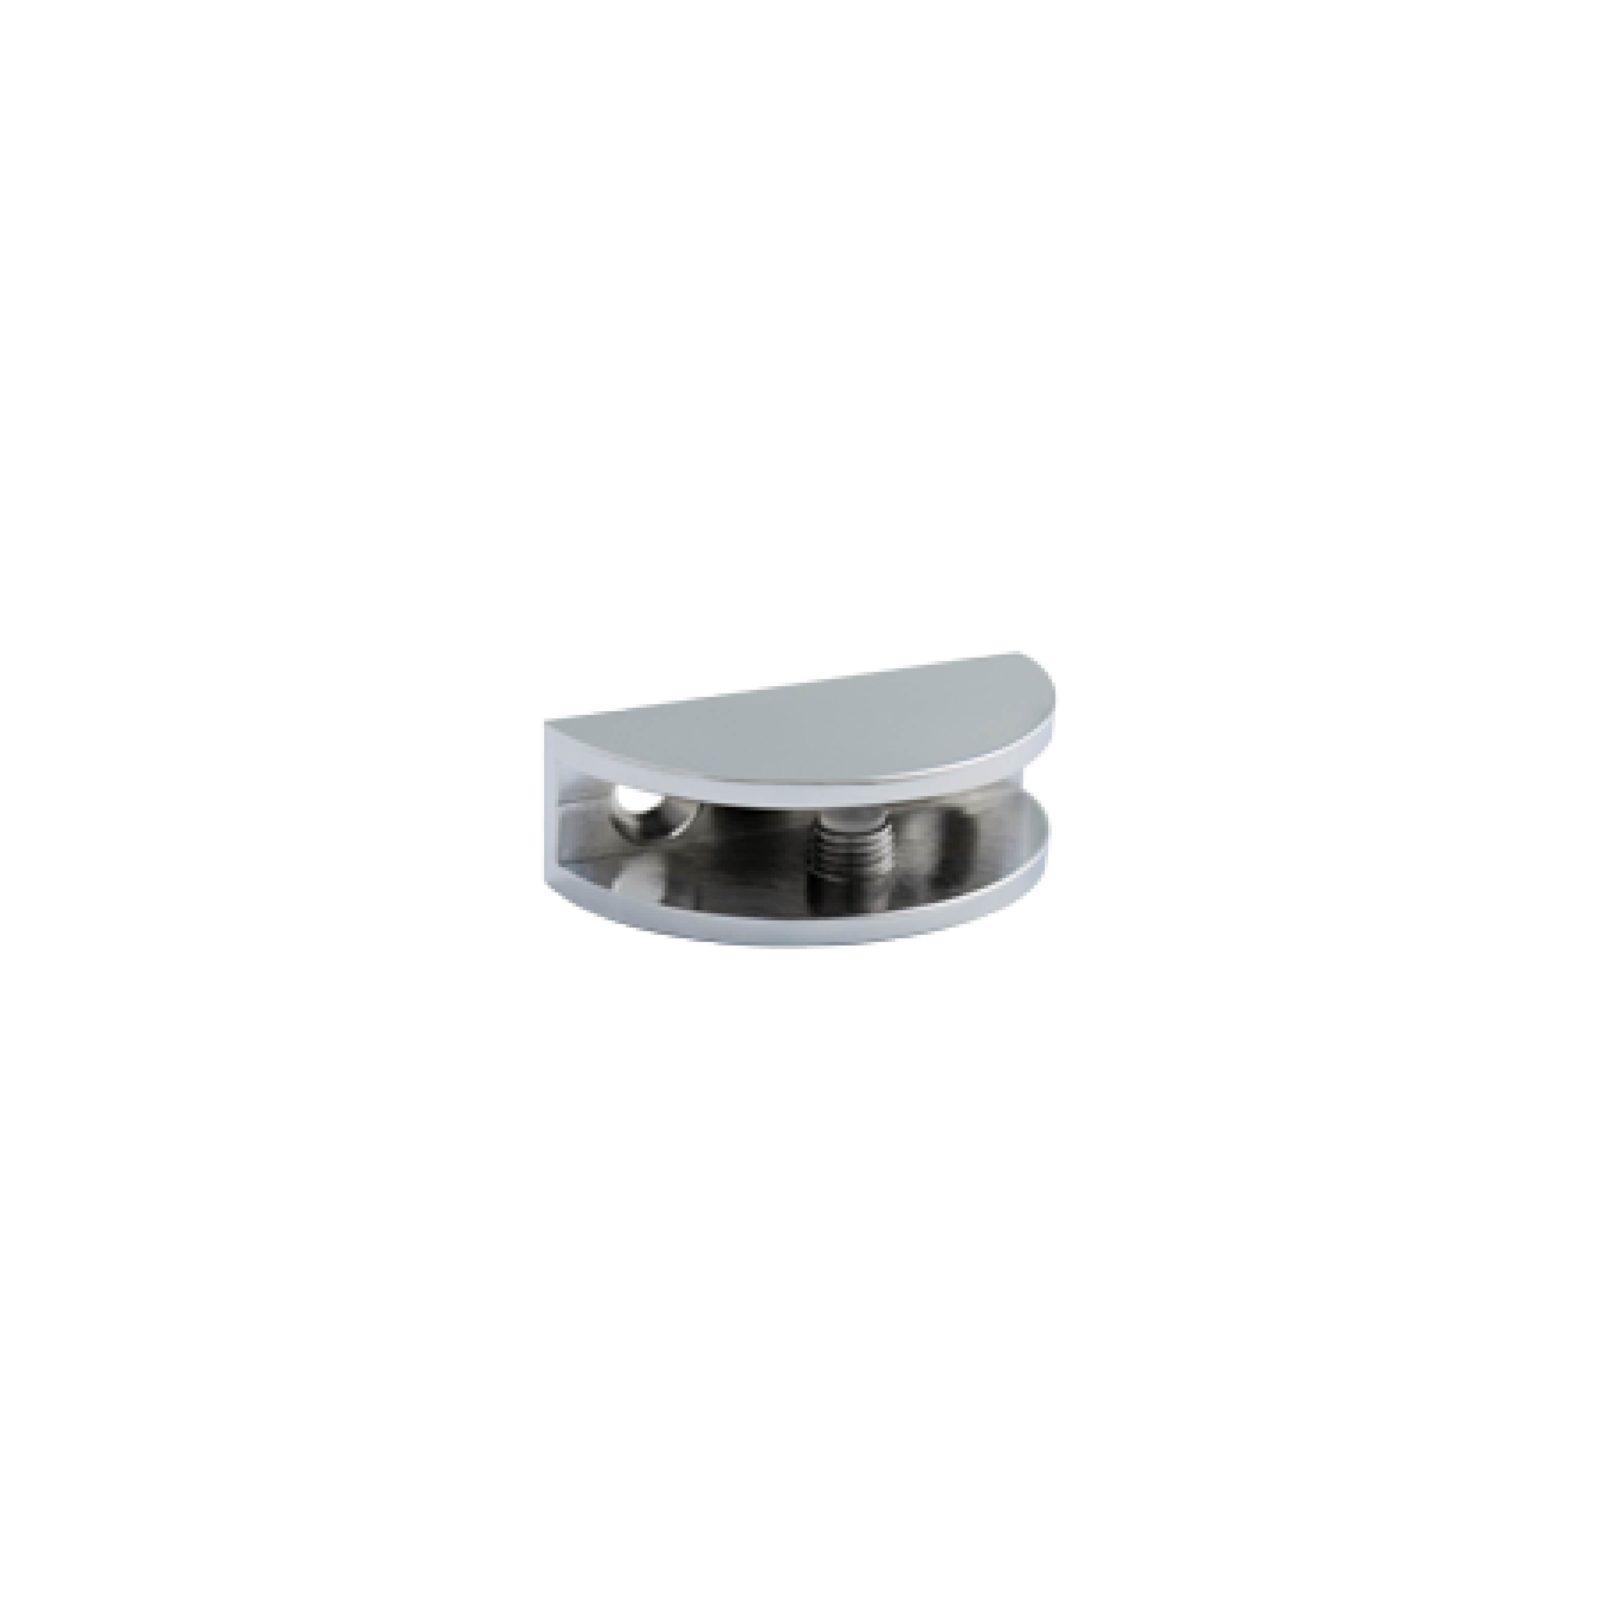 Steel Optic Focus 2 Spray High Arc Kitchen Faucet Schillings